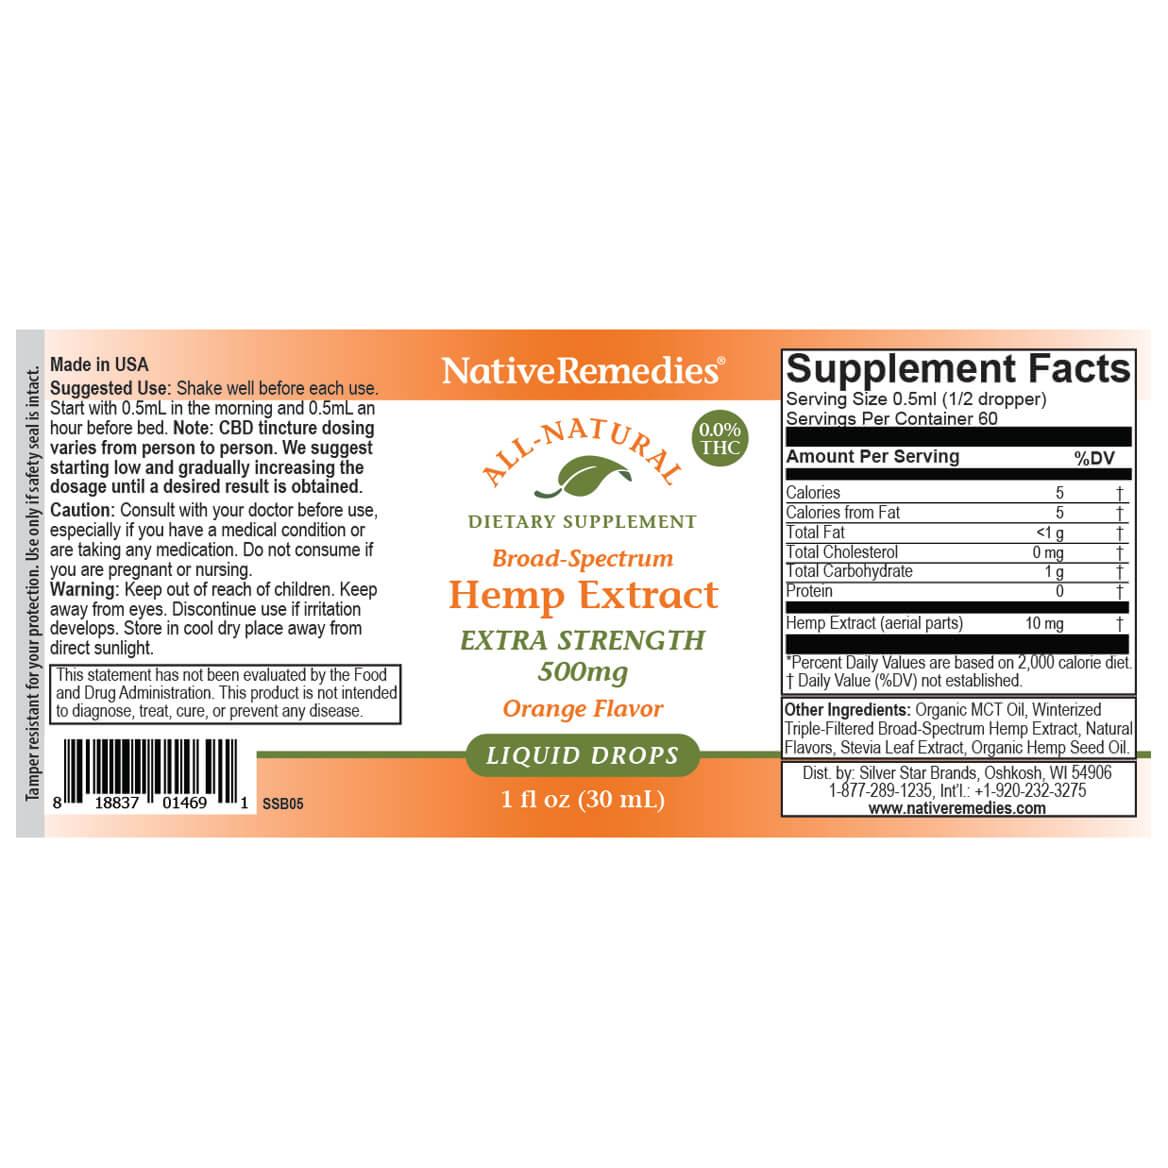 NativeRemedies® Extra-Strength Hemp Extract 500 mg-367950